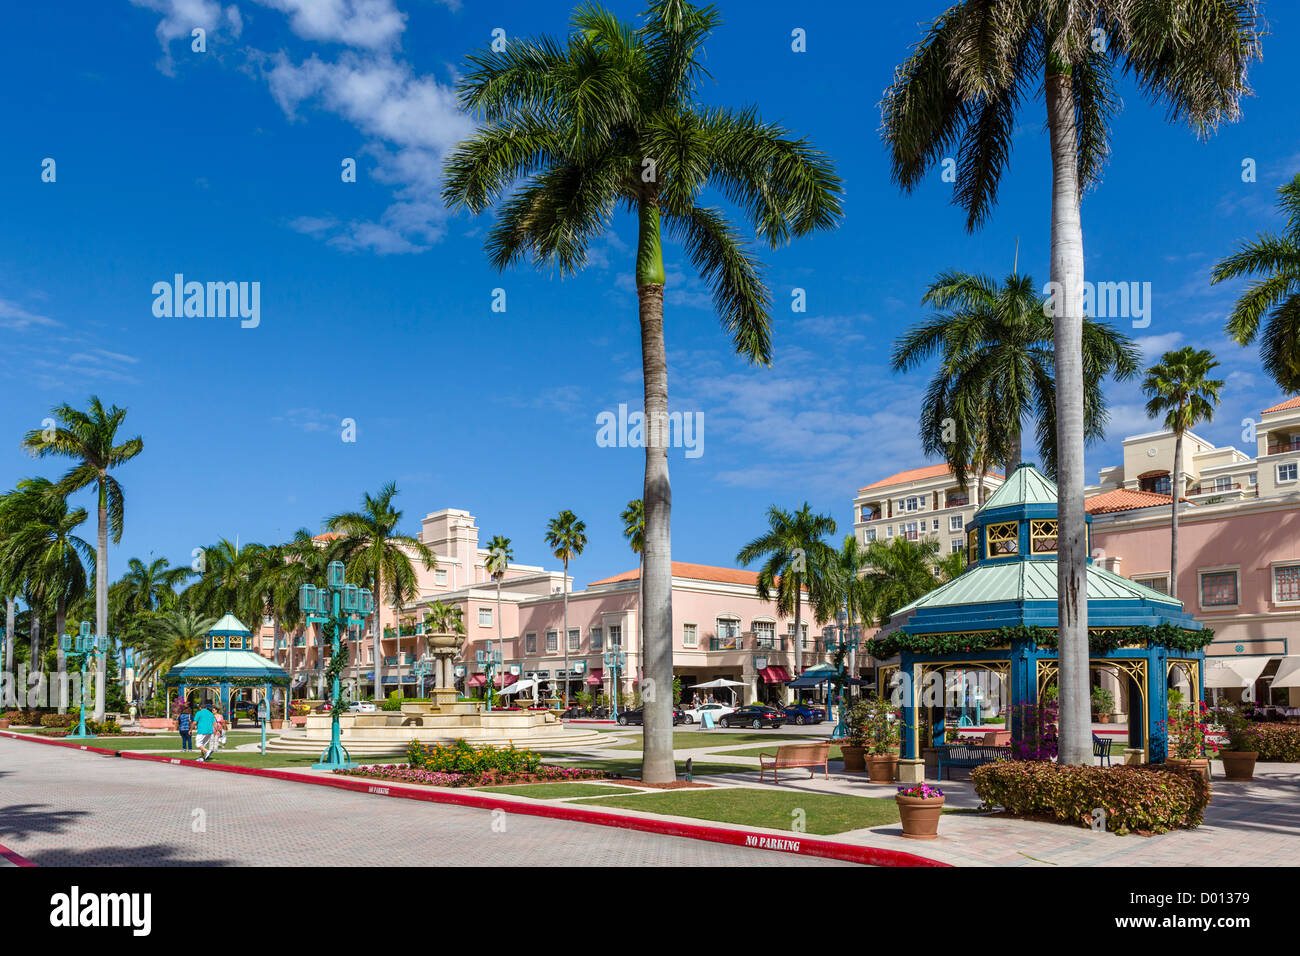 The Mizner Park development in Boca Raton, Treasure Coast, Florida, USA - Stock Image